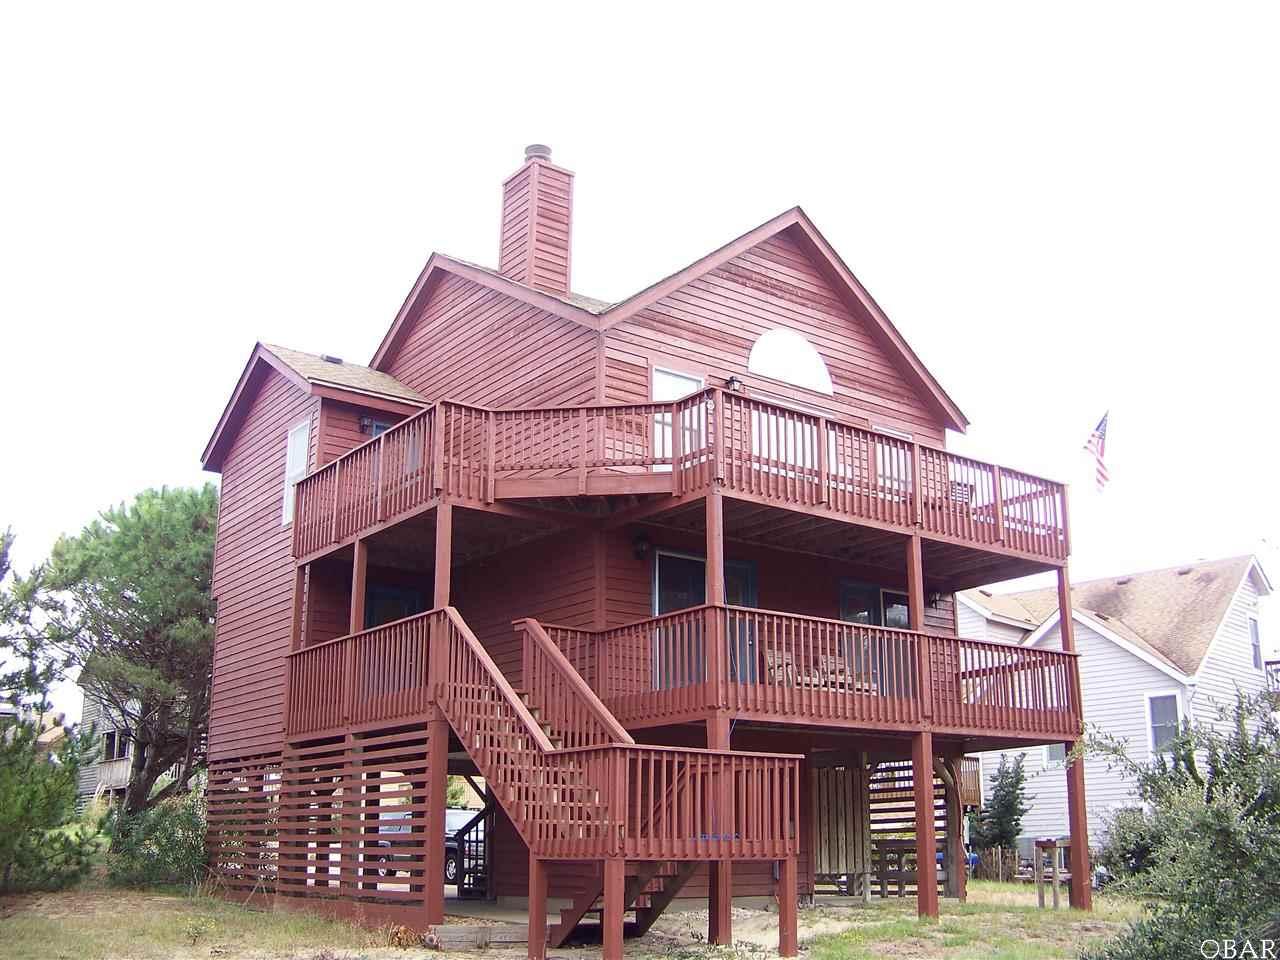 4124 Vansciver Drive,Nags Head,NC 27959,4 Bedrooms Bedrooms,2 BathroomsBathrooms,Residential,Vansciver Drive,85622